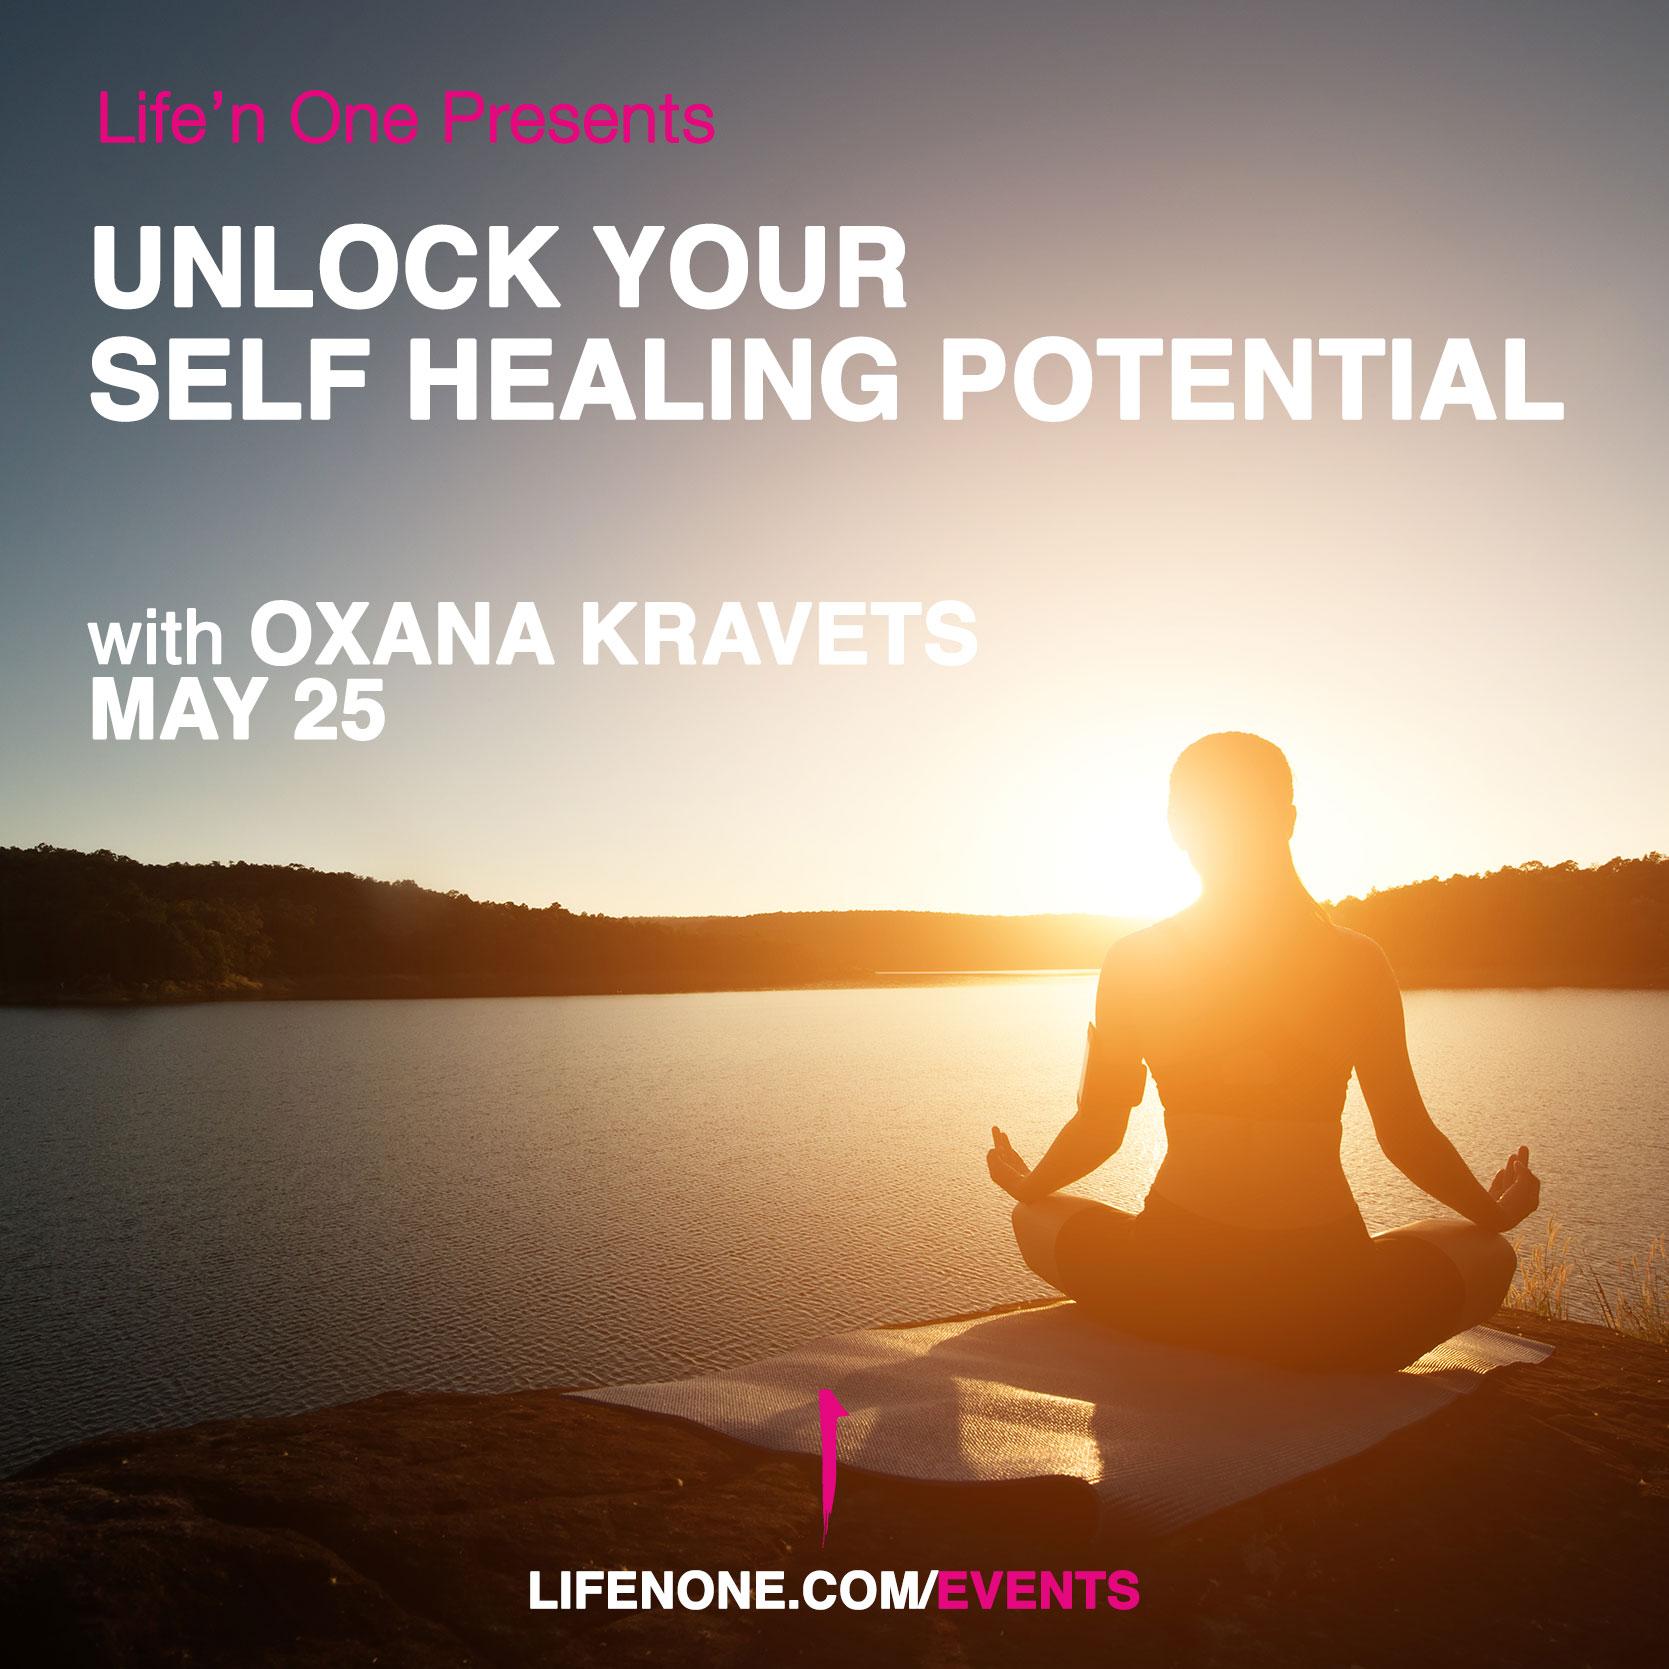 may25-oxana-self-healing.jpg